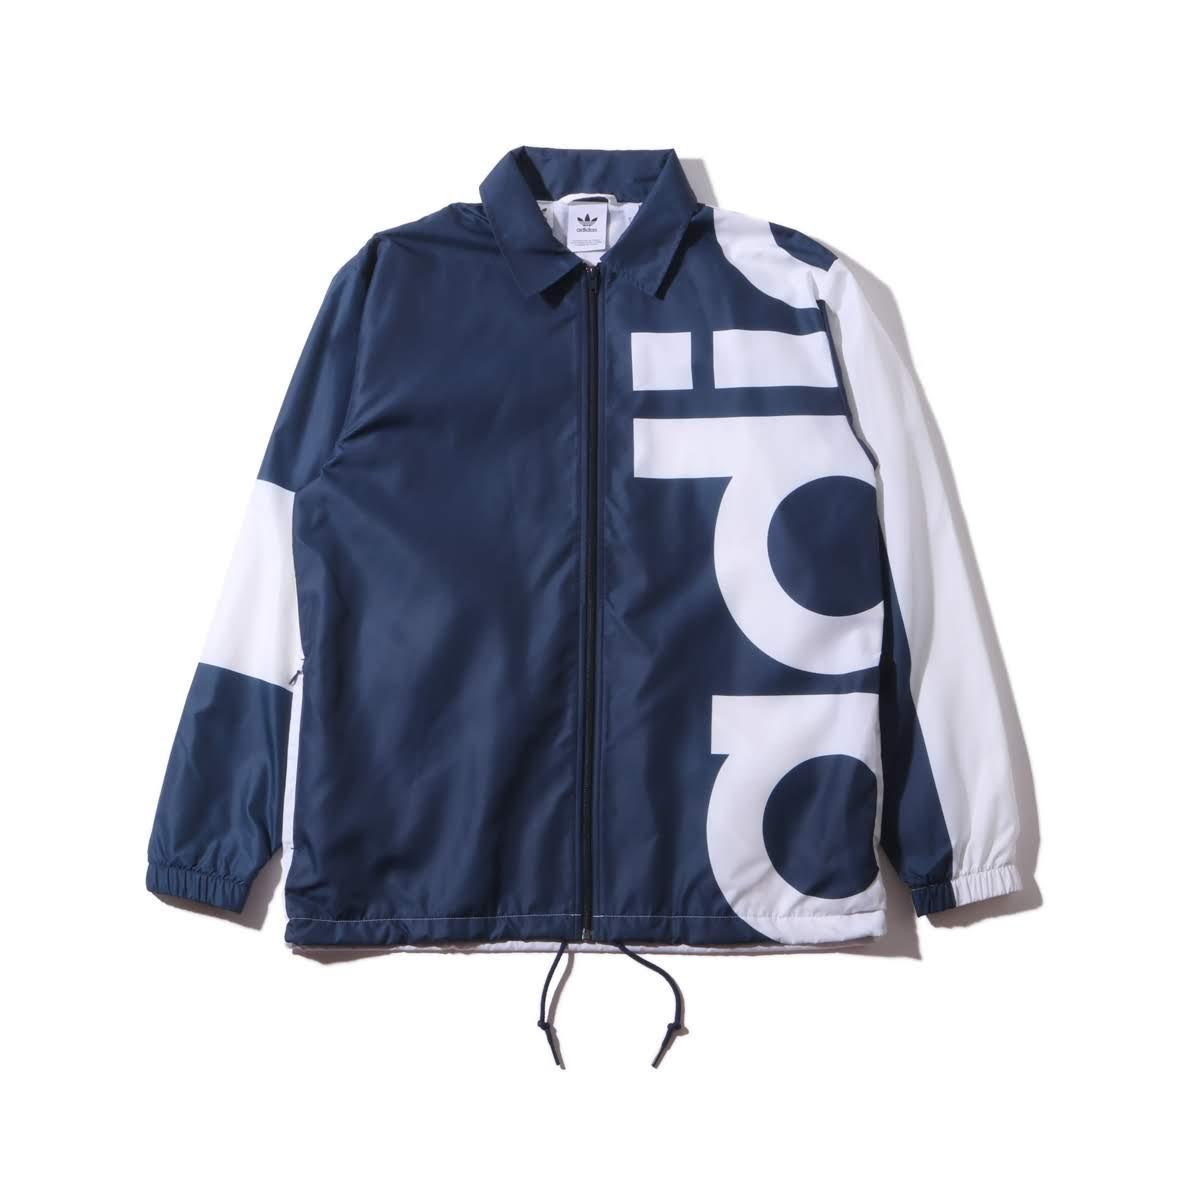 adidas Originals BIG ADI WINDBREAKER(COLLEGE NAVY/WHITE)(アディダスオリジナルス ビッグ アディ ウインドブレイカー)【メンズ】【ジャケット】【19SS-I】